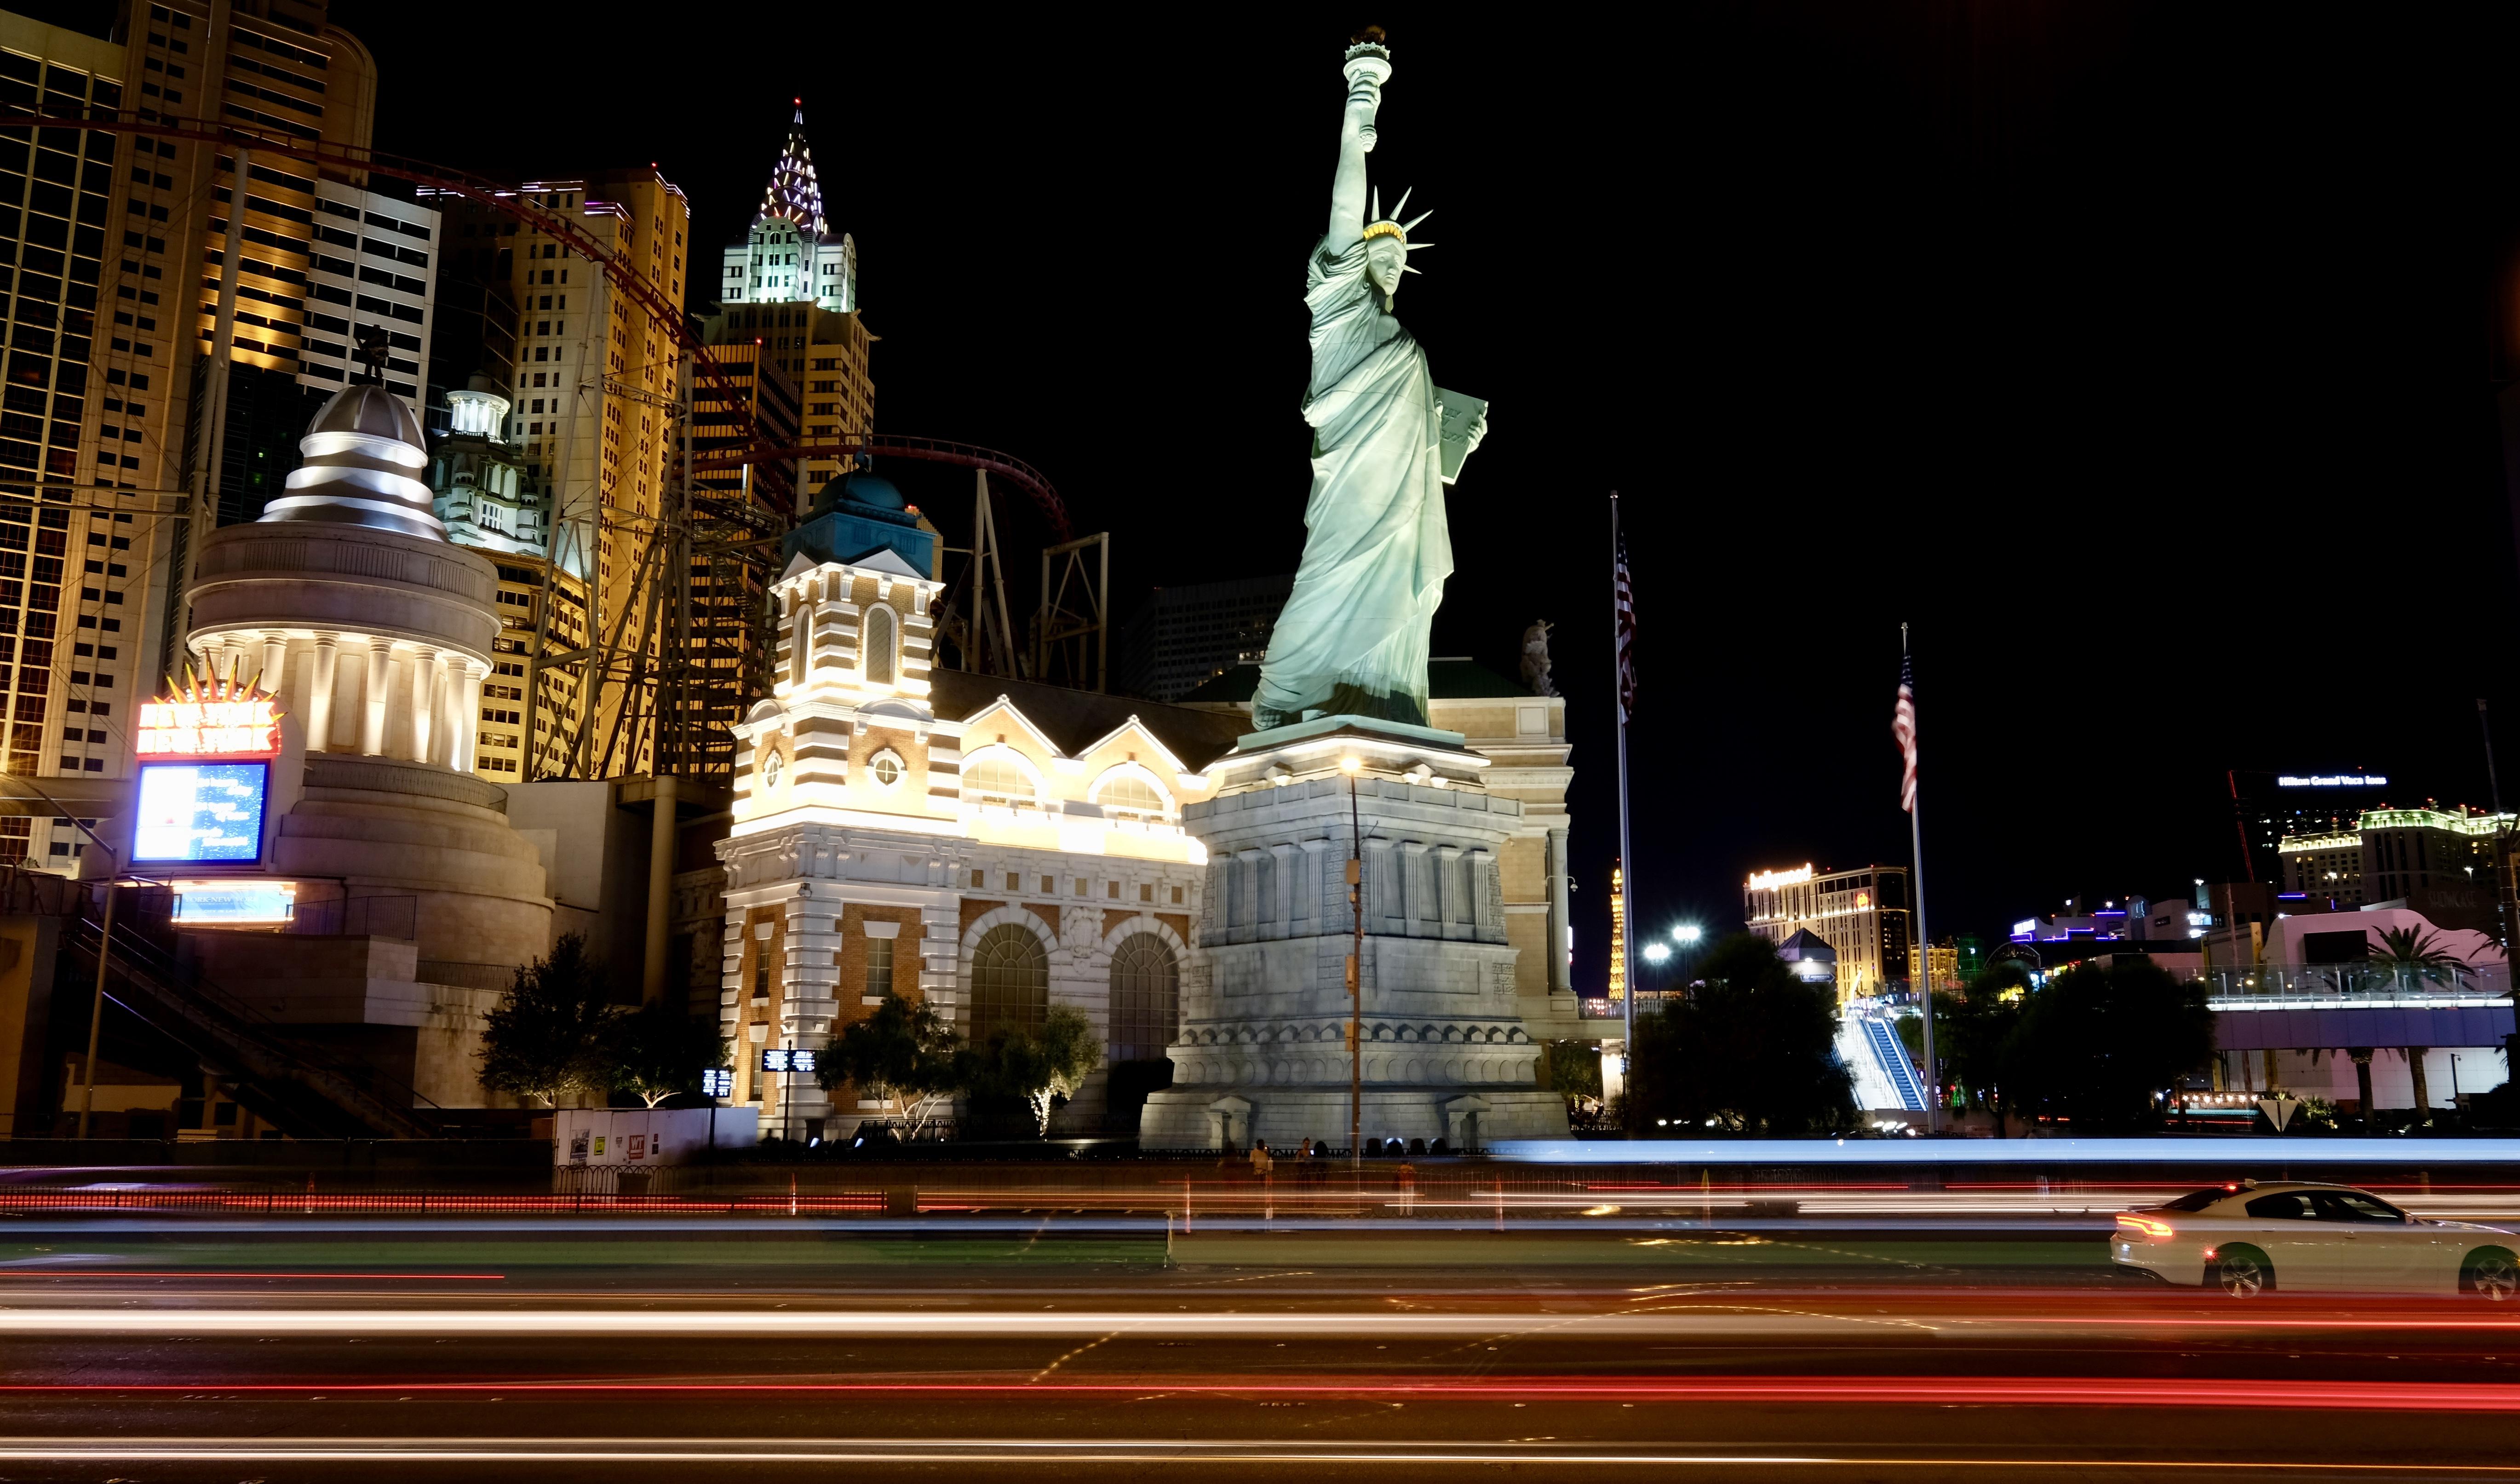 Las Vegas - New York New York